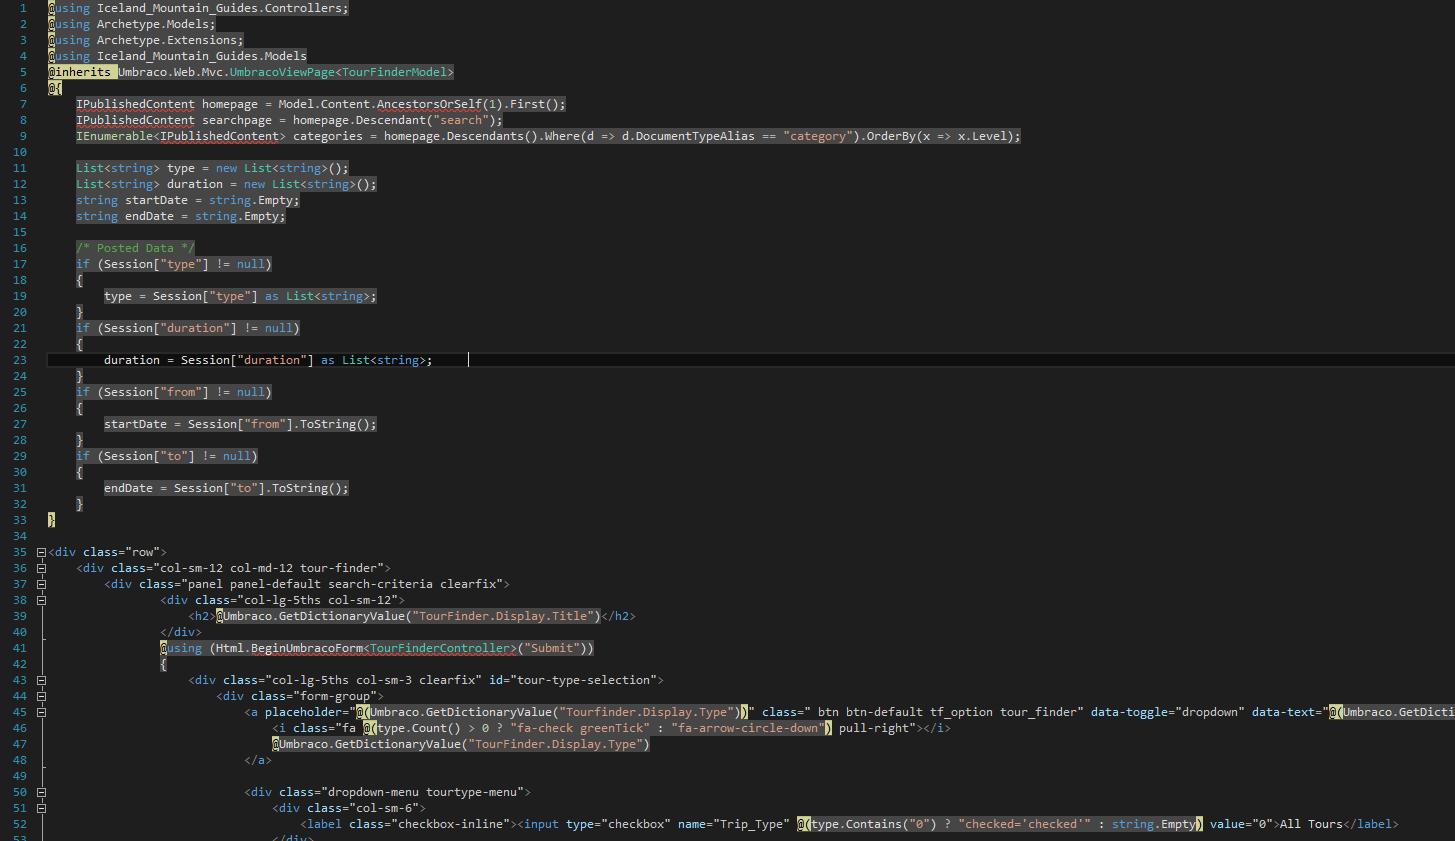 intellisense type or namespace name ipublishedcontent could